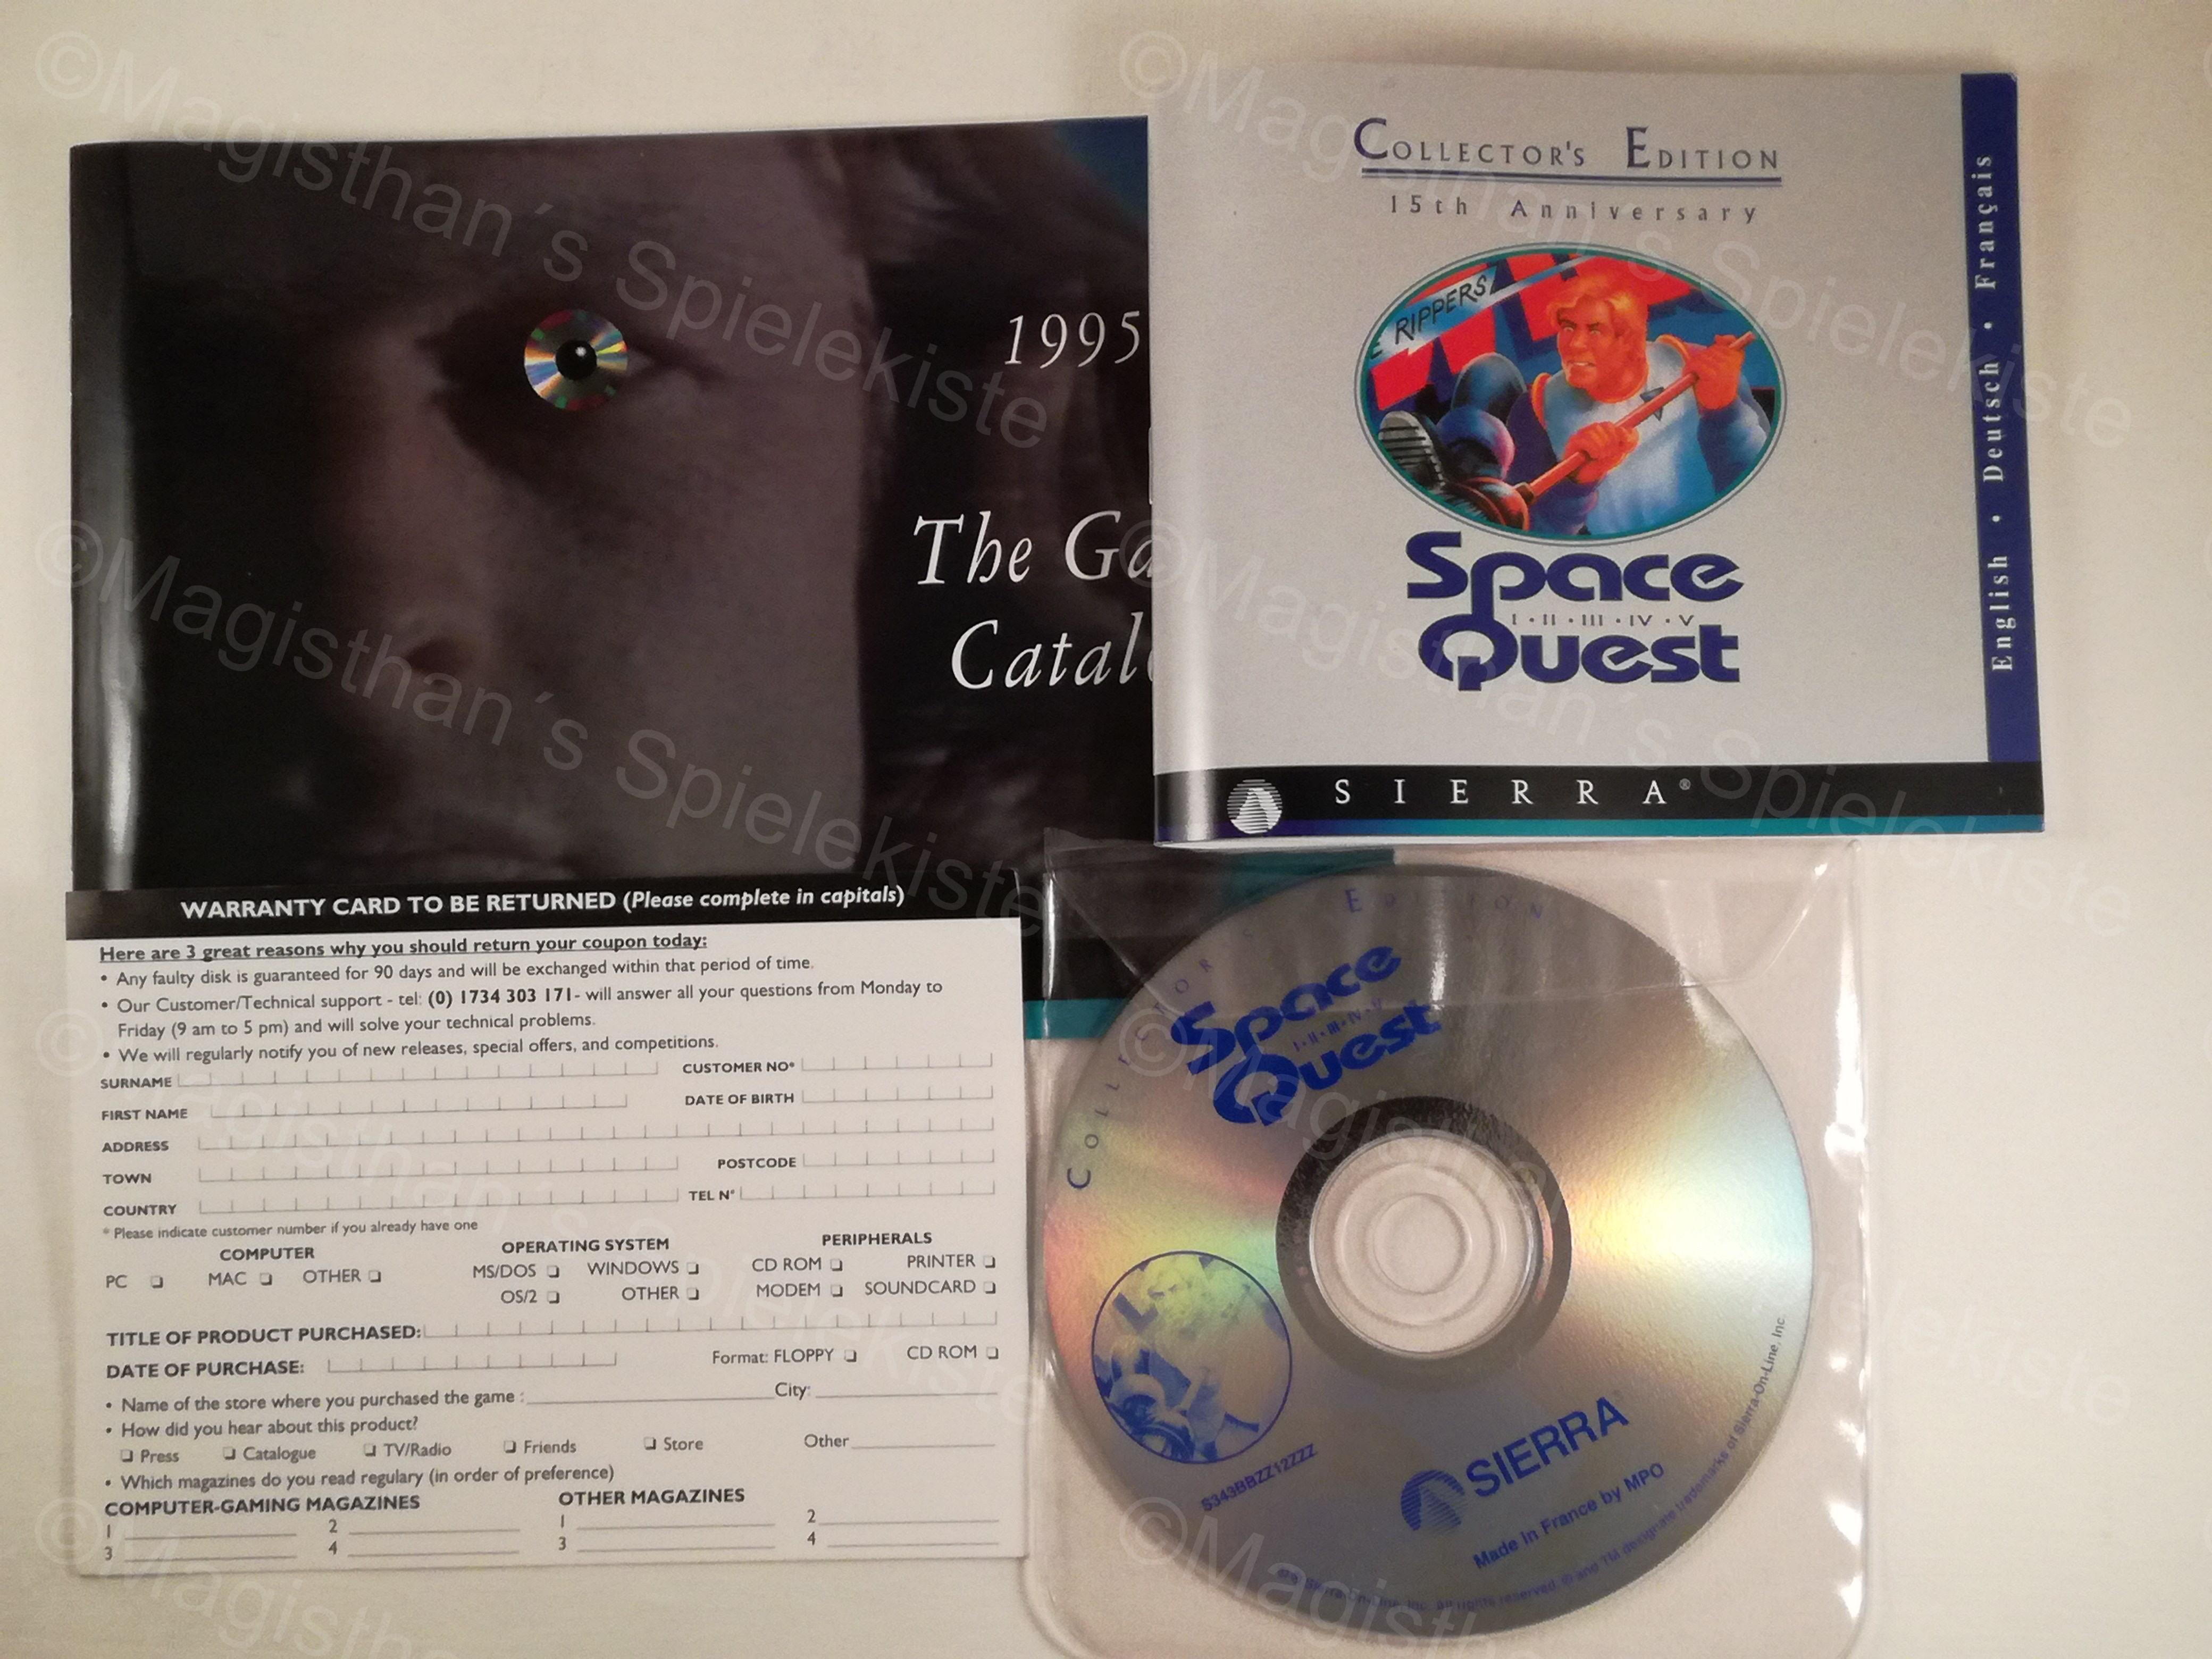 SpaceQuestCollectorsEdition2.jpg